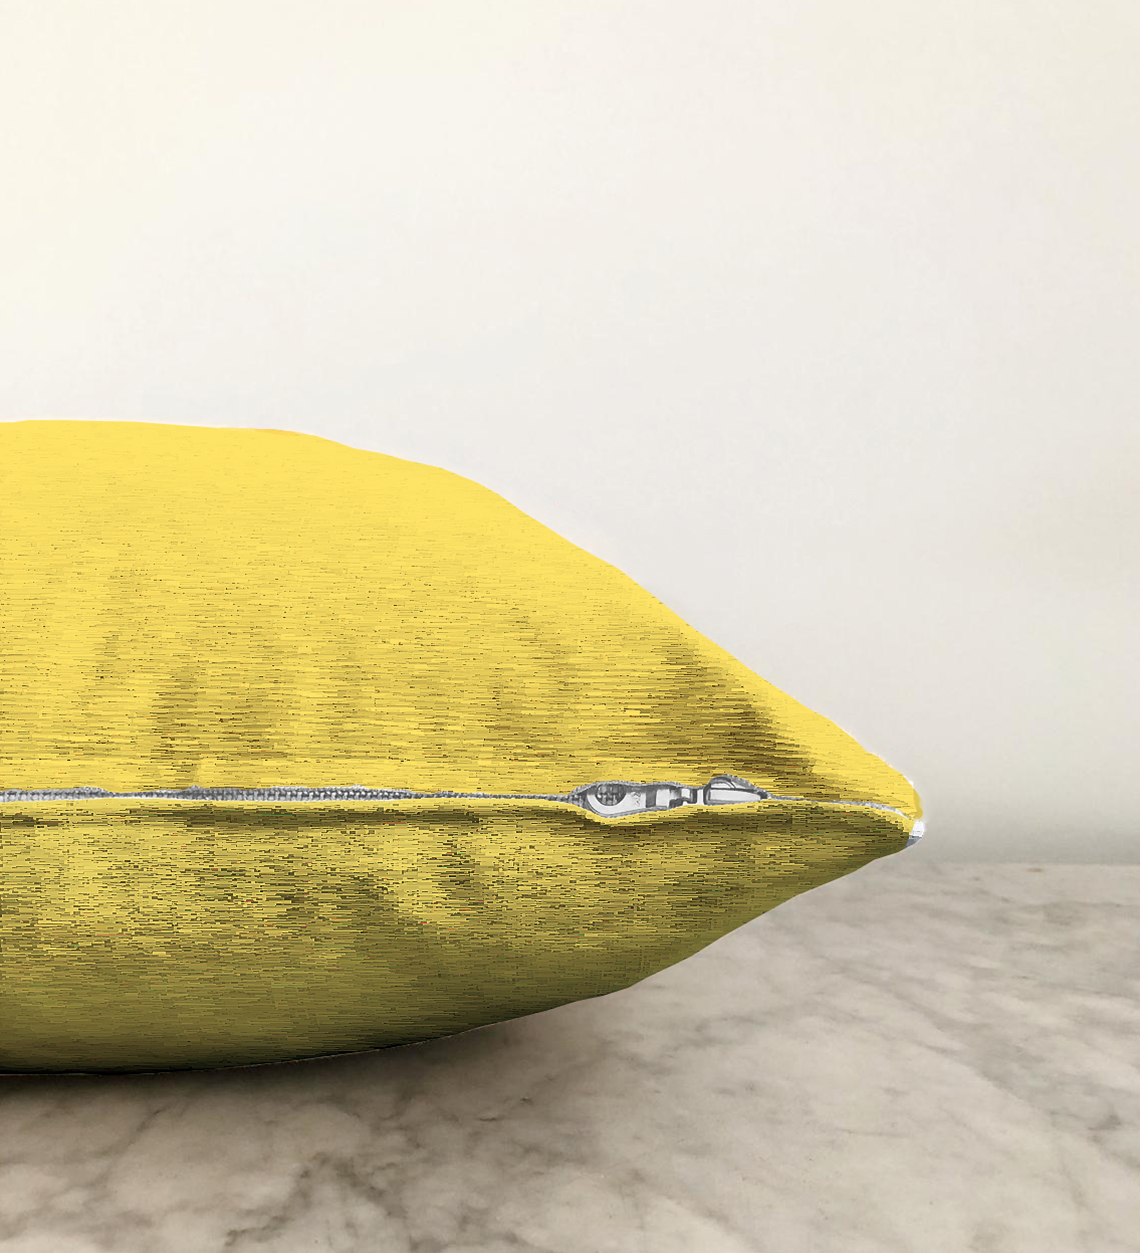 Realhomes Çift Taraflı Sarı Renkli Dijital Baskılı Şönil Yastık Kırlent Kılıfı - 55 x 55 cm Realhomes